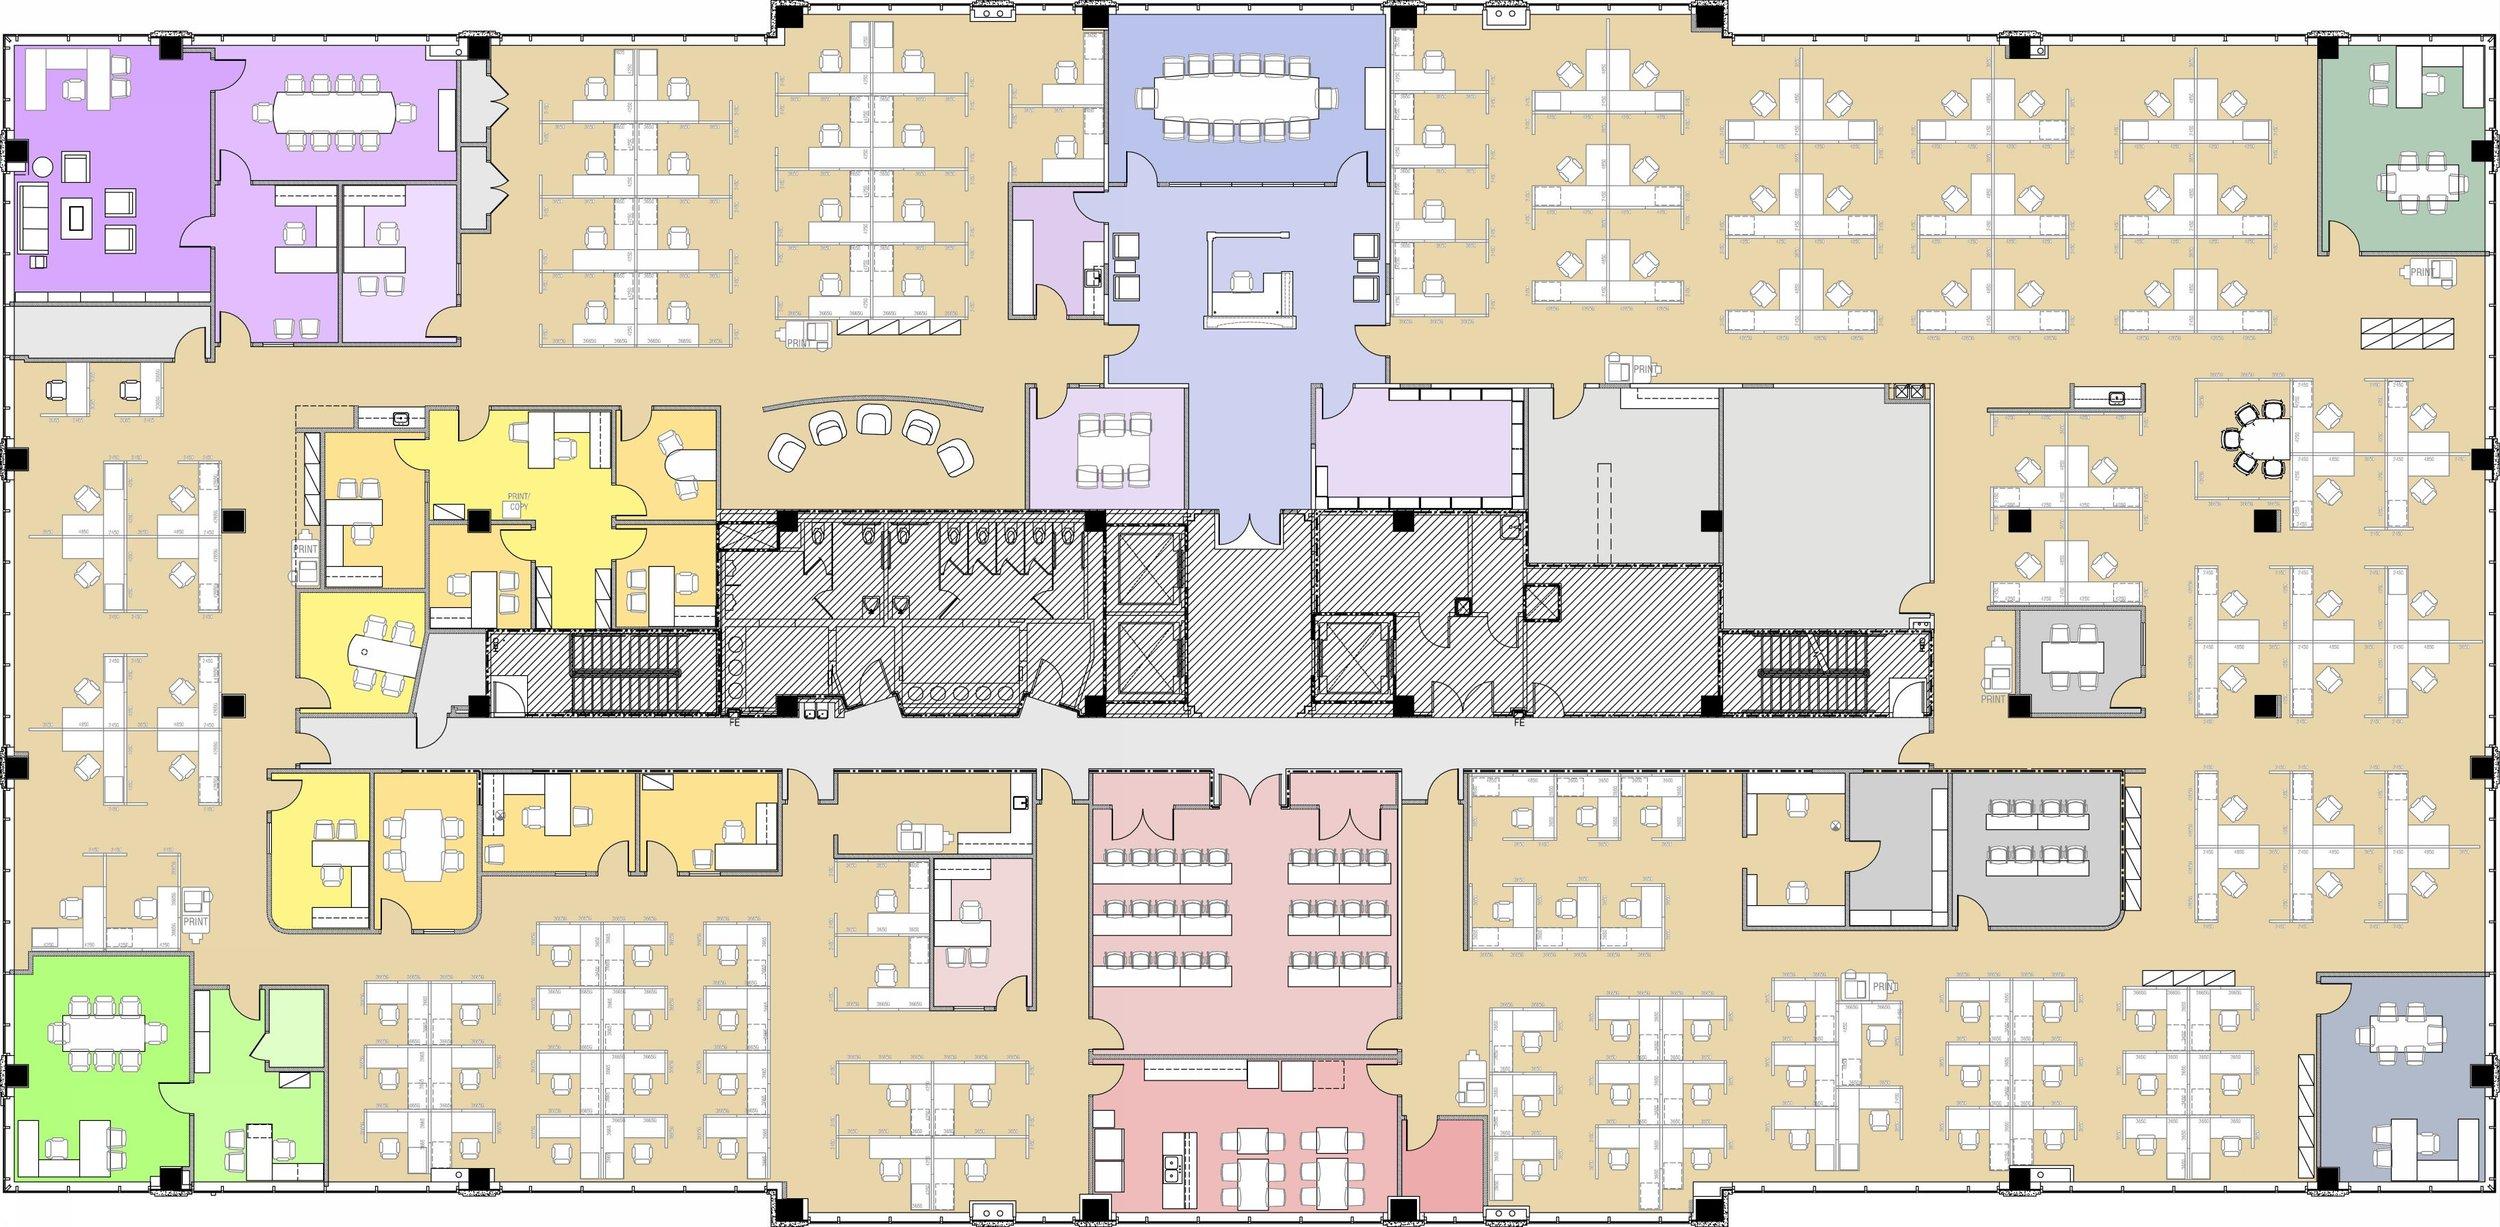 Final Space Plan - 25,000 USF